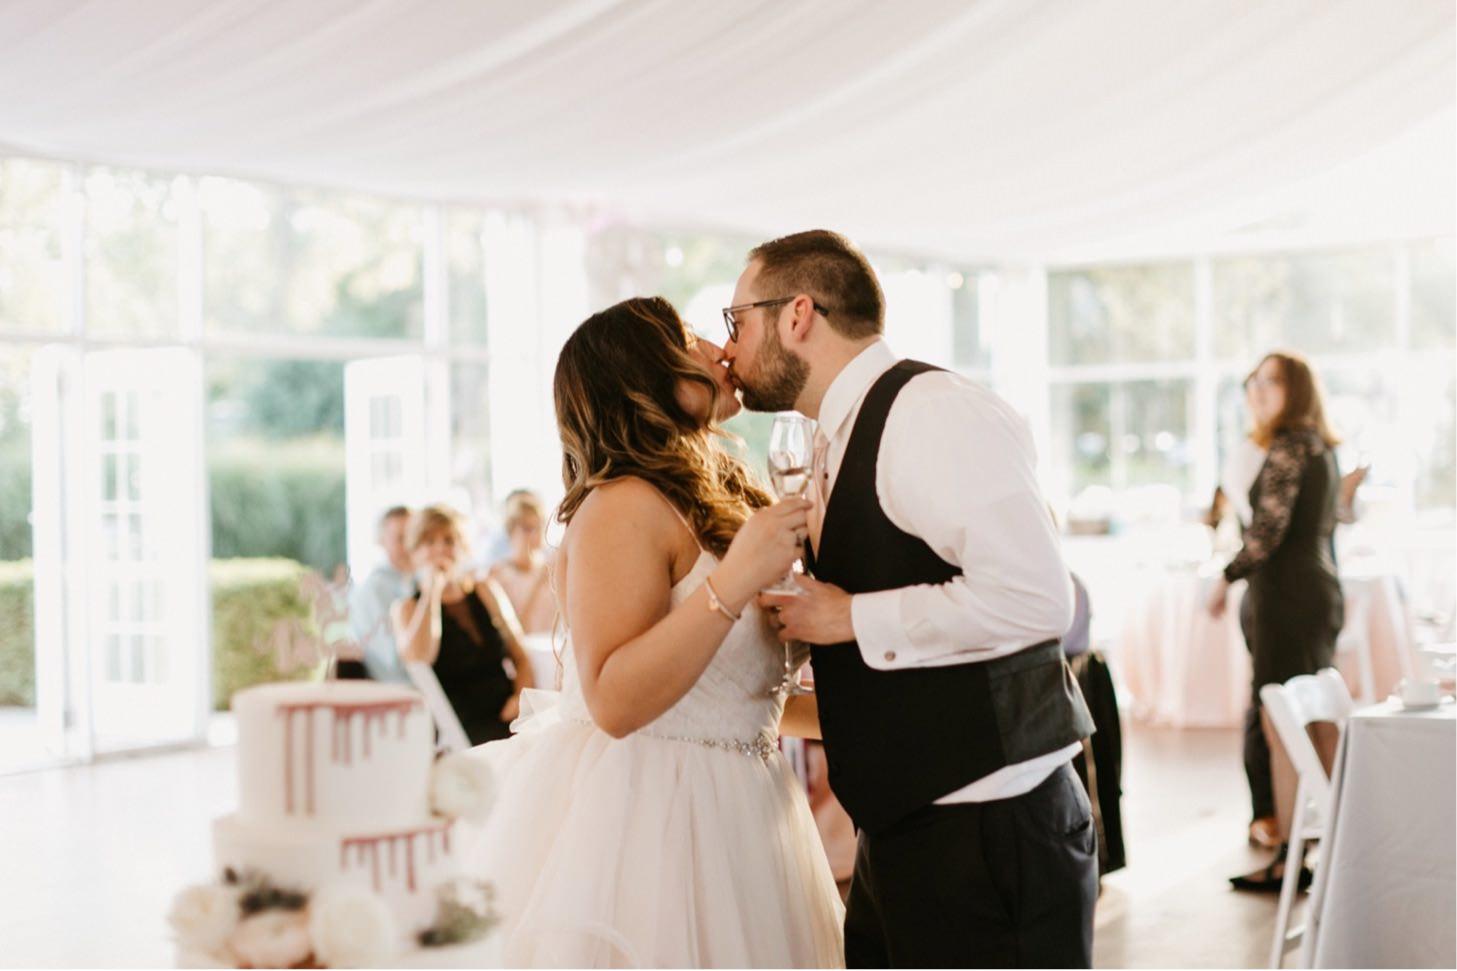 ritz-charles-wedding-reception-downtown-indianapolis-wedding-photographer034.JPG